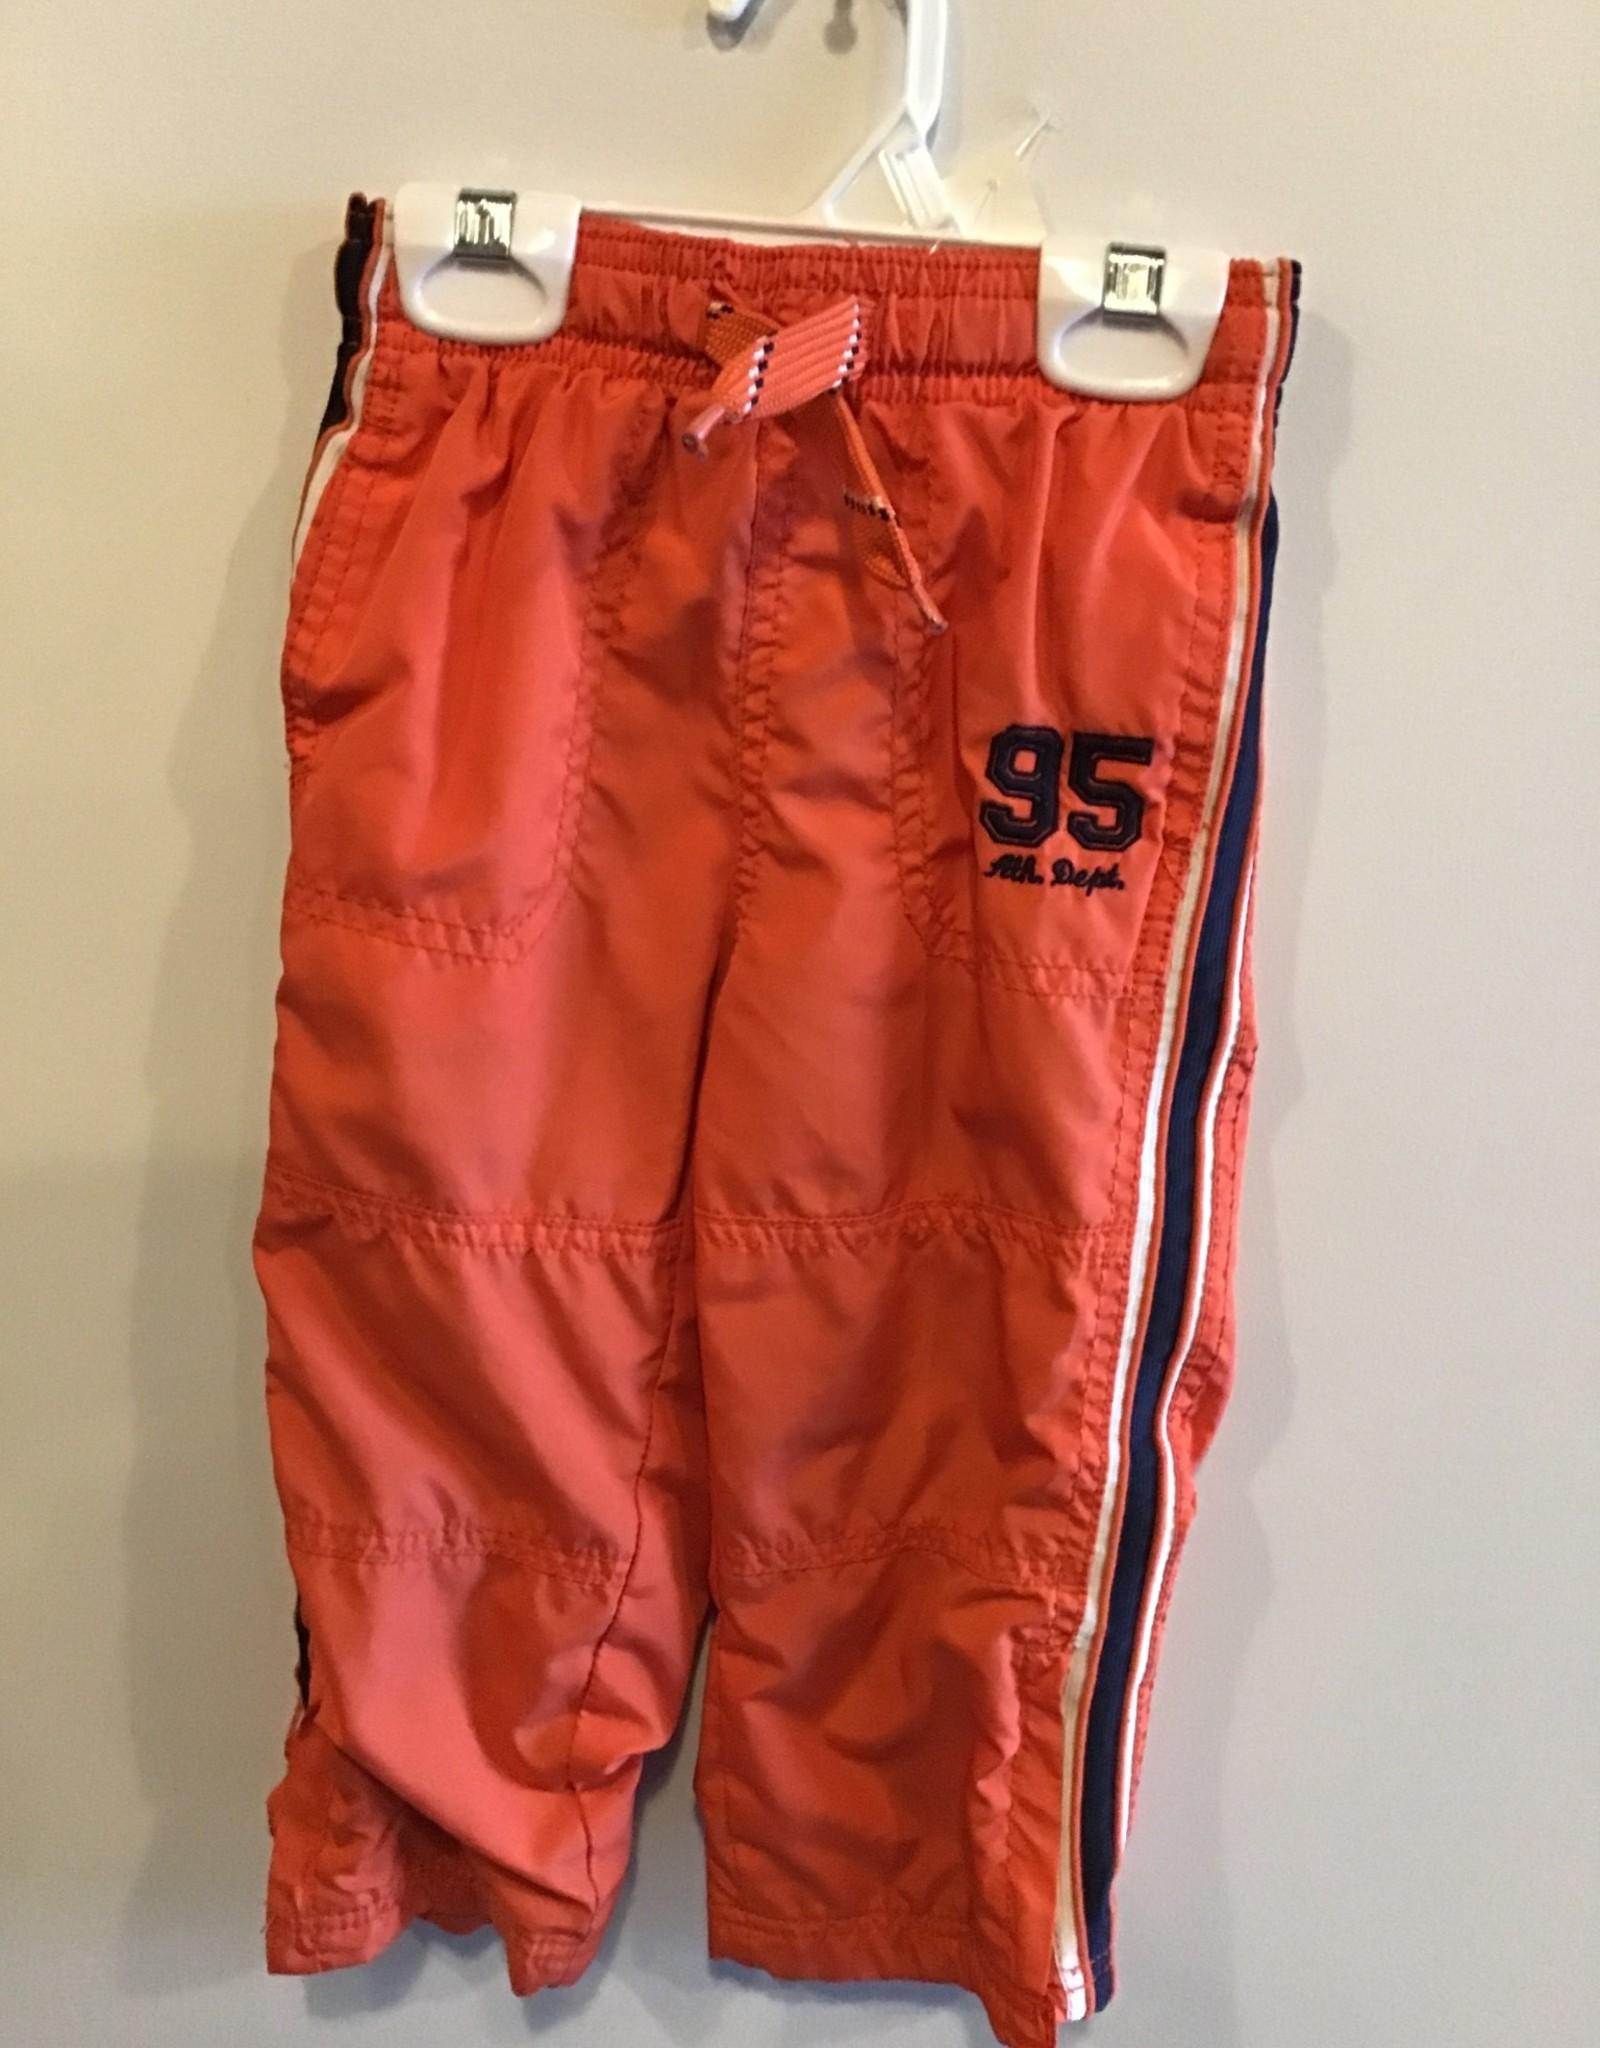 Osh Kosh Boys/2T/OshKosh/Pants